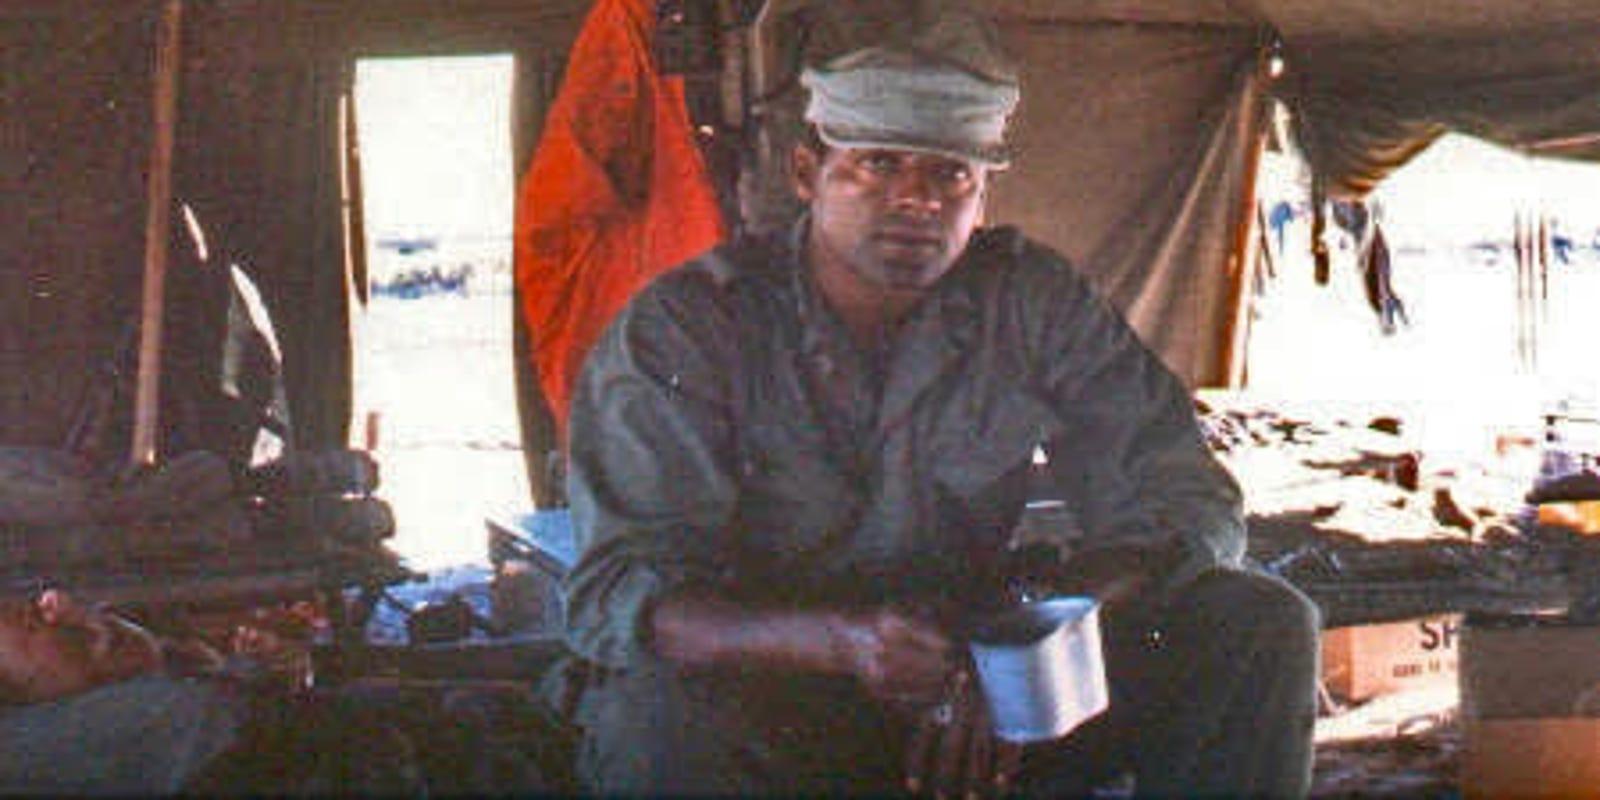 Vietnam heroism will lead Oxnard man to military's highest honor